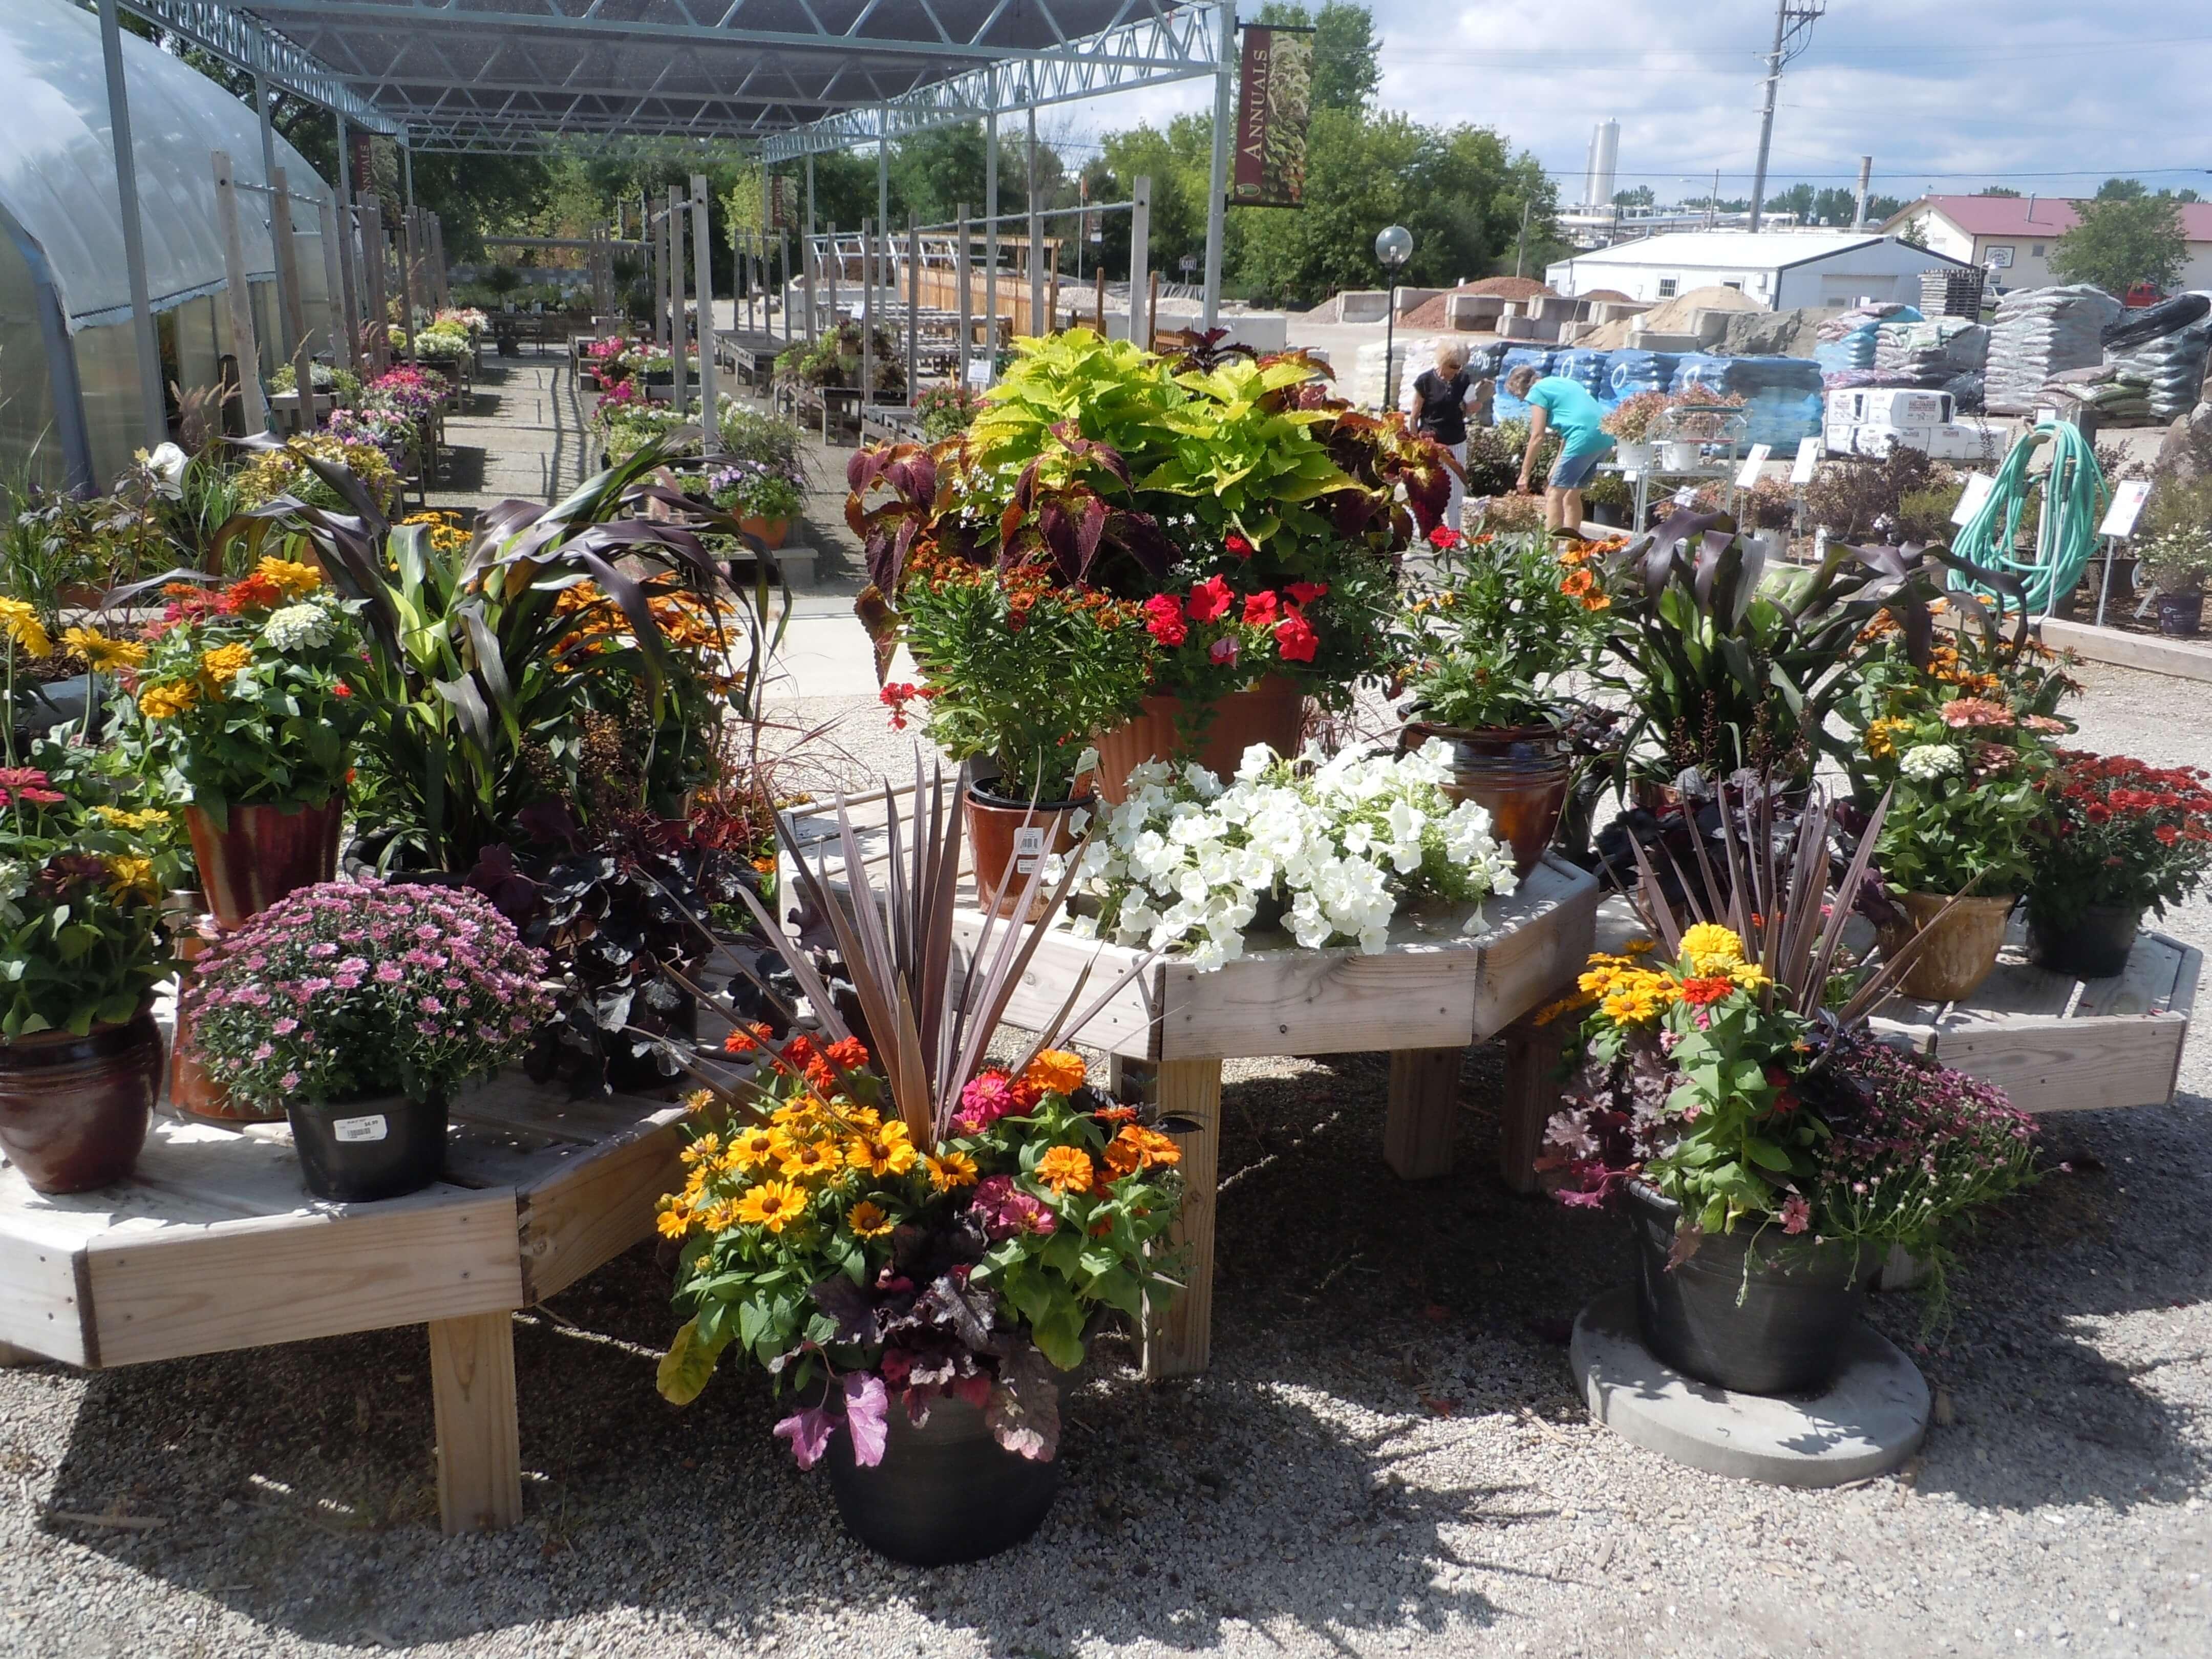 Blodgett Garden Center image 2